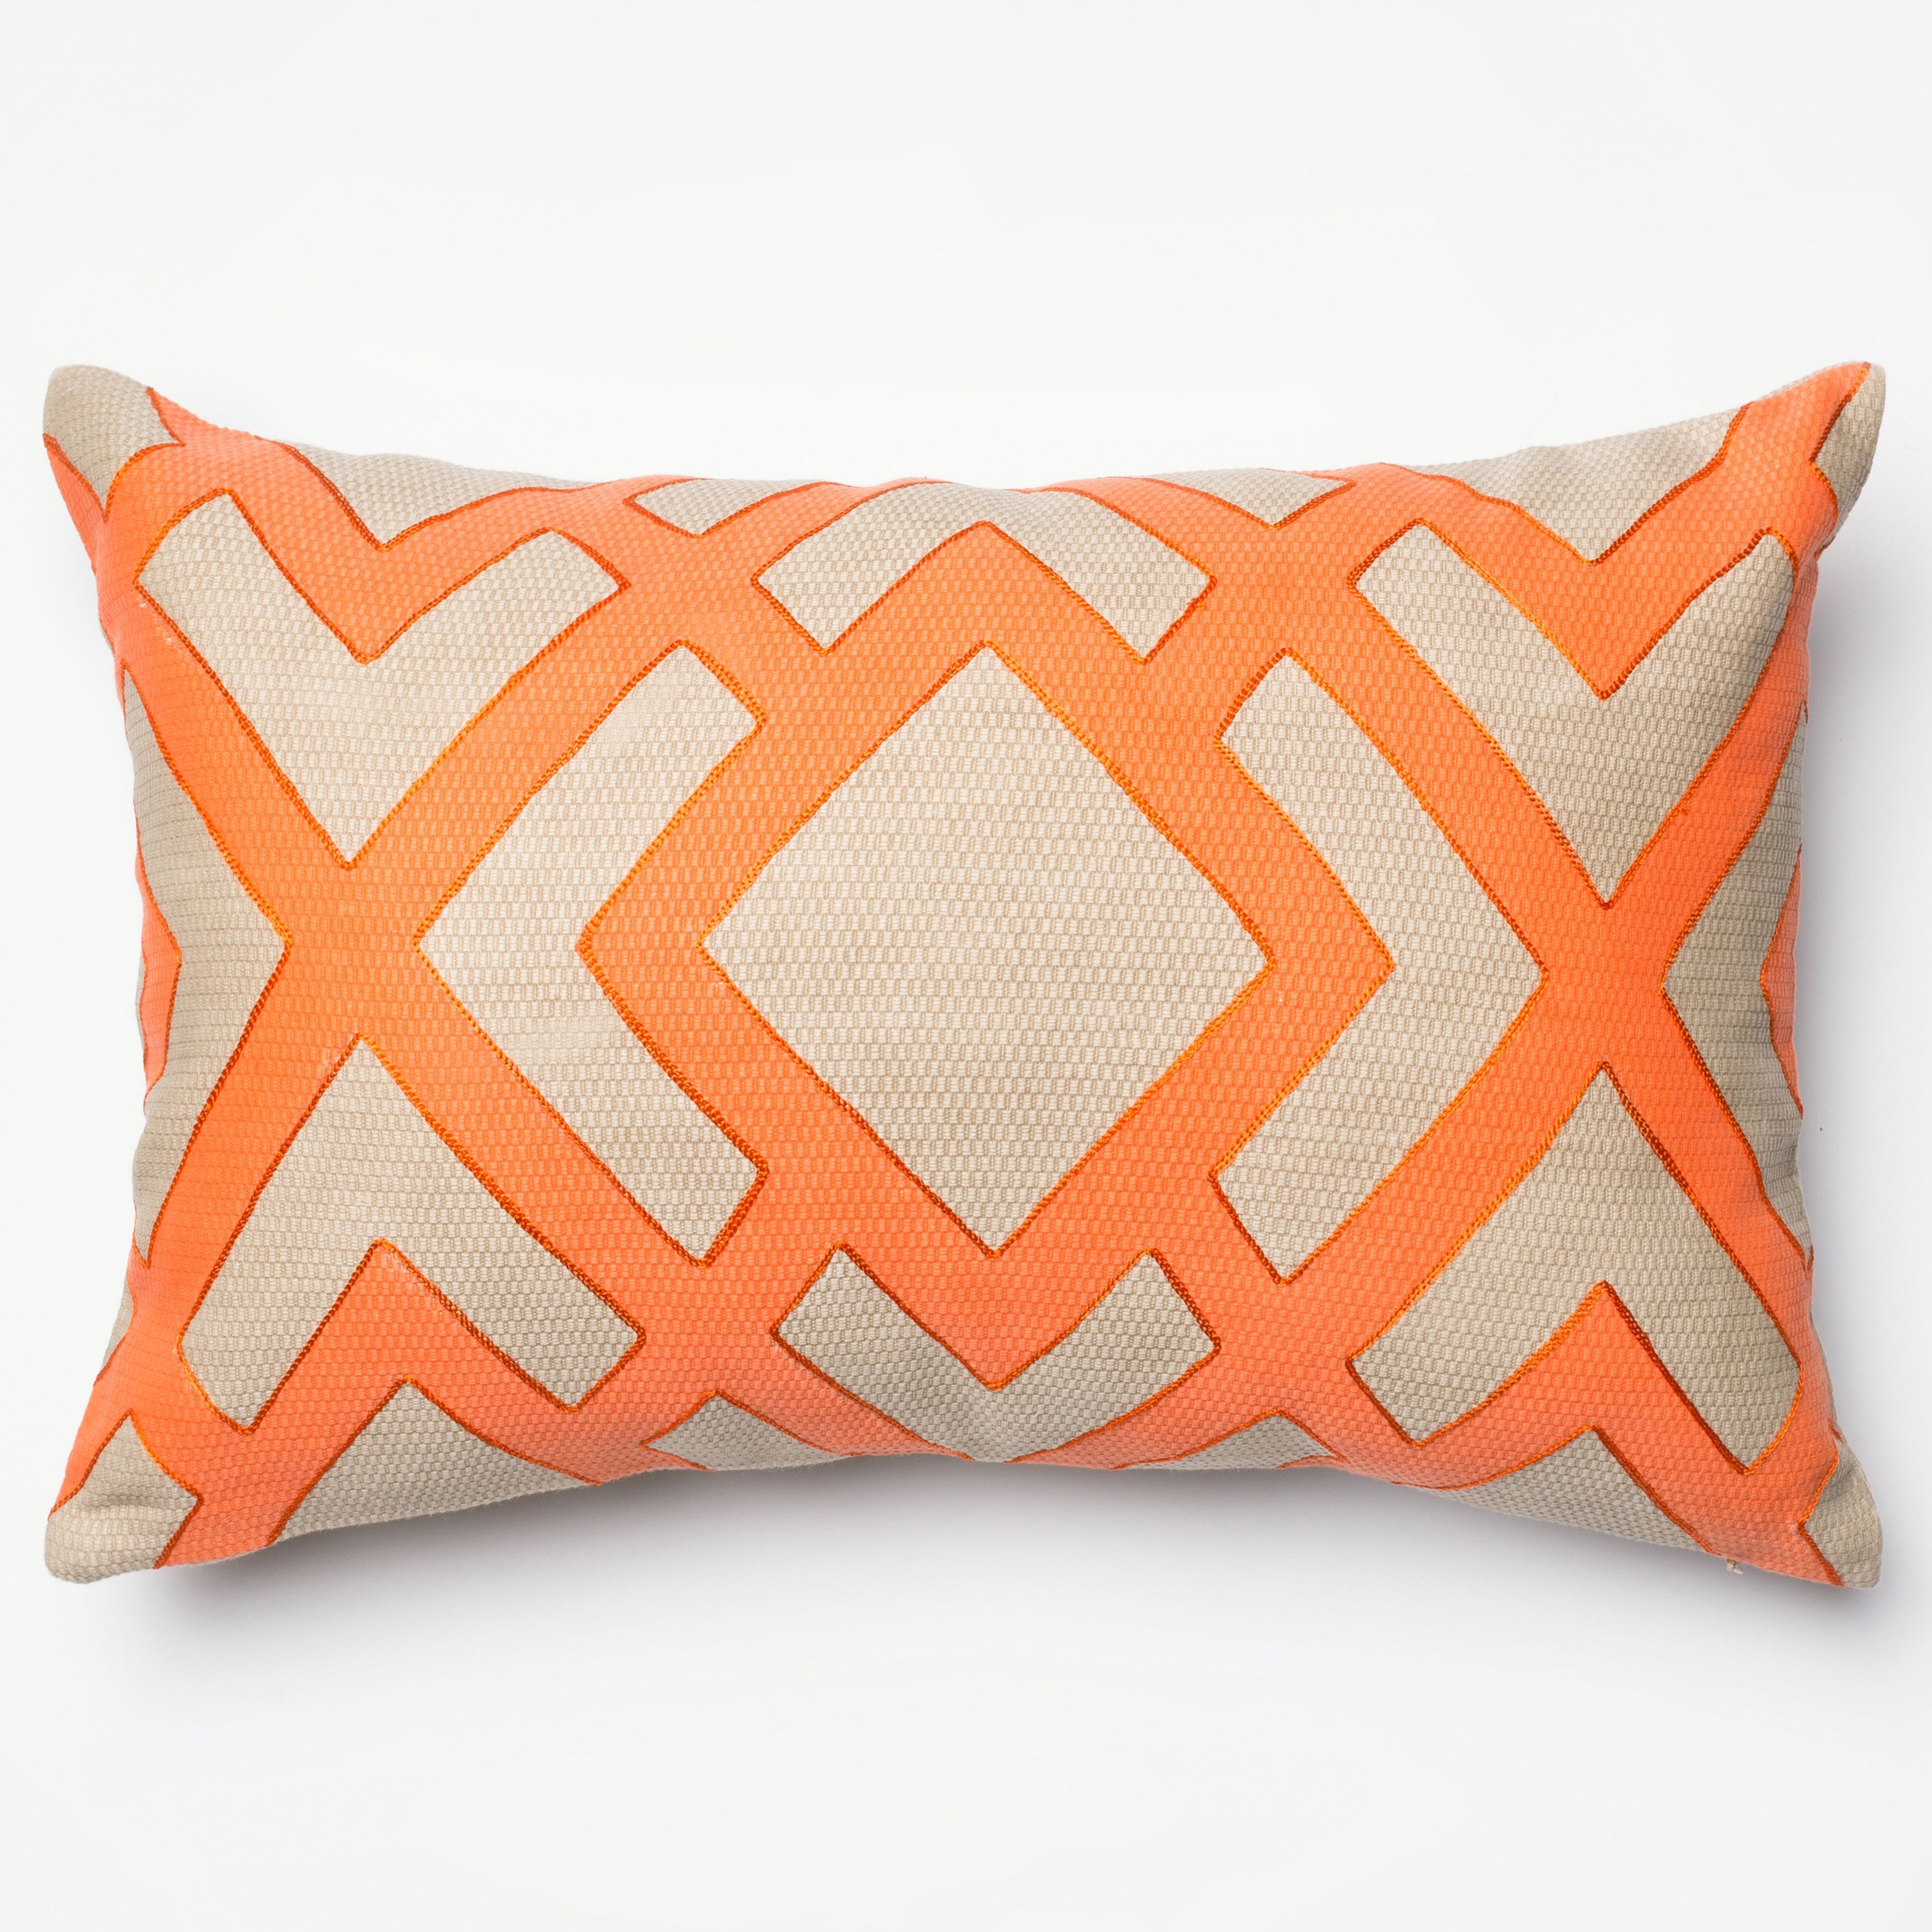 perigold marine pdp oceana orange outdoor elaine decor smith lumbar elainesmith pillow